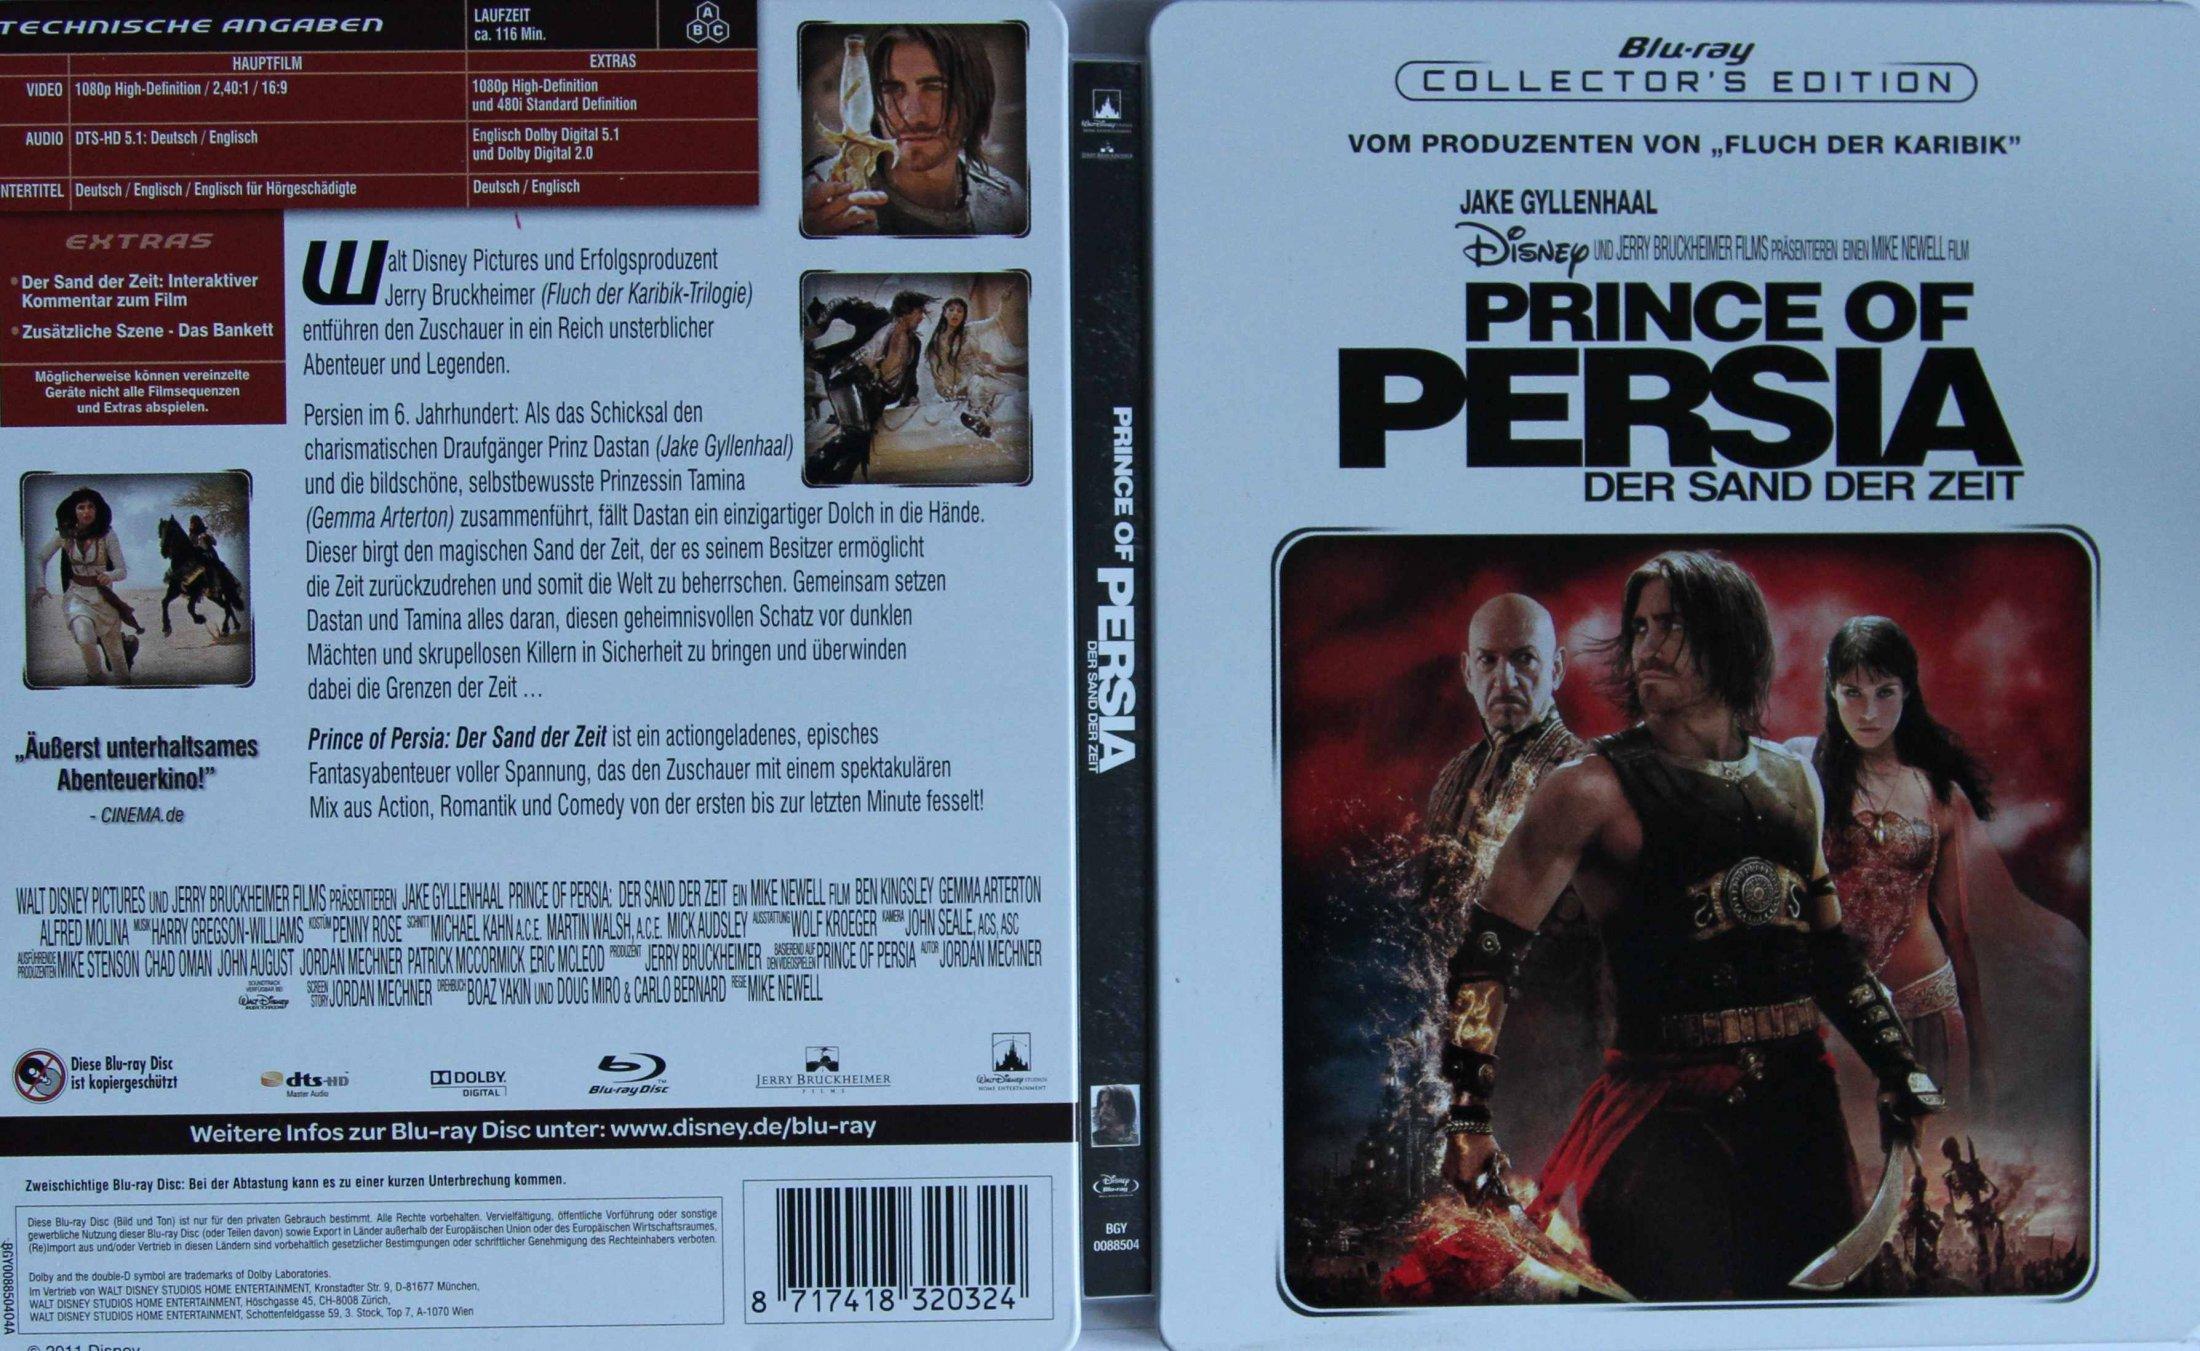 Prince of Persia Steelbook aussen